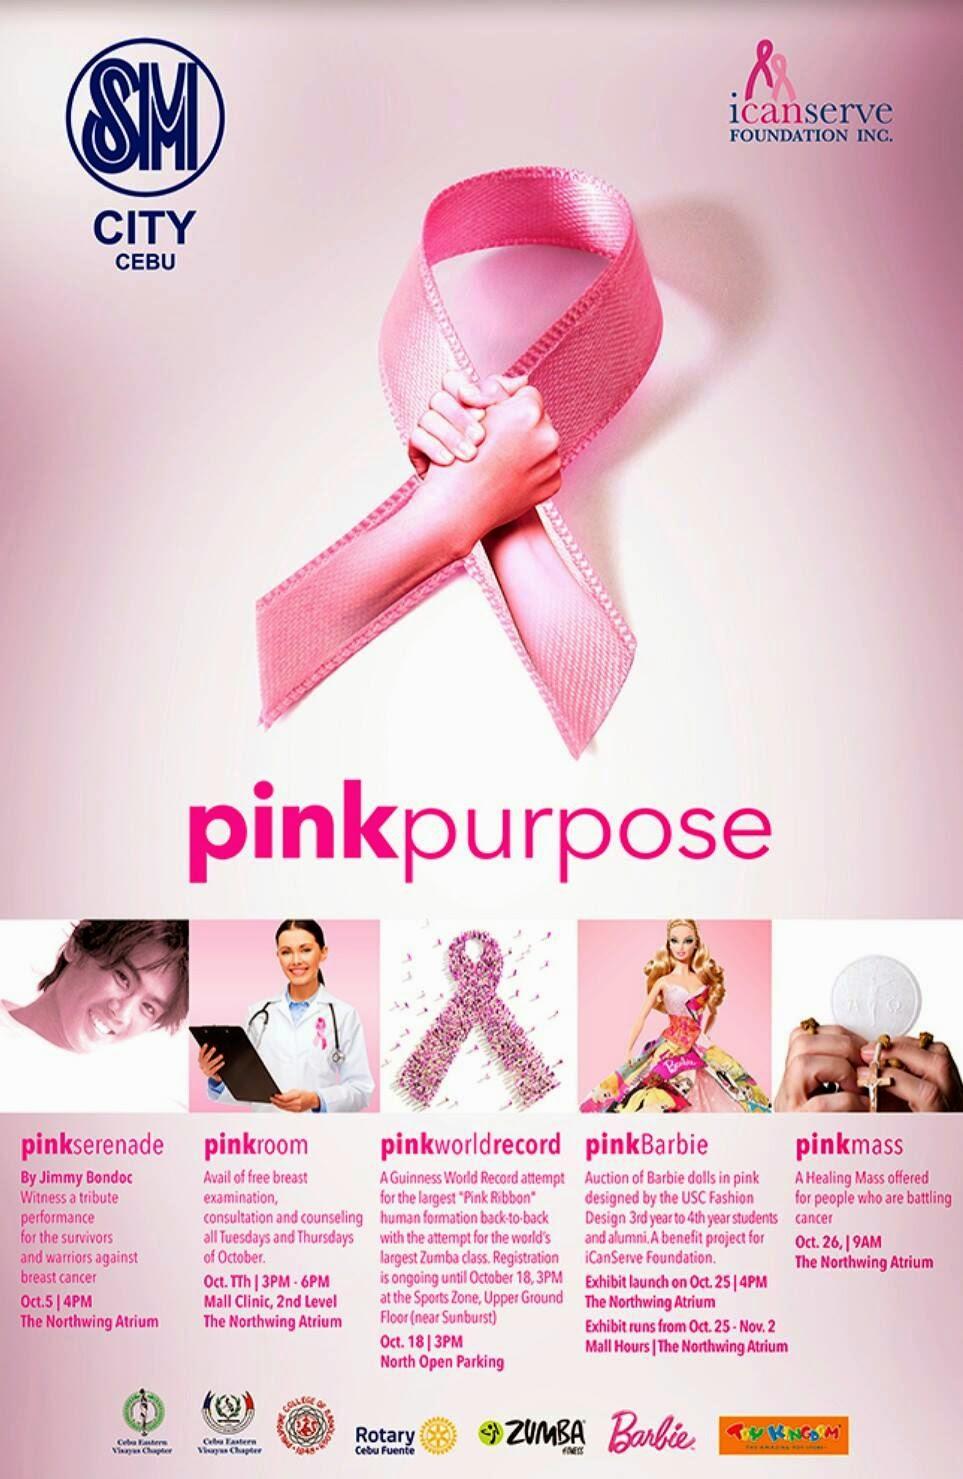 SM-City-Cebu-Pink-Purpose-October